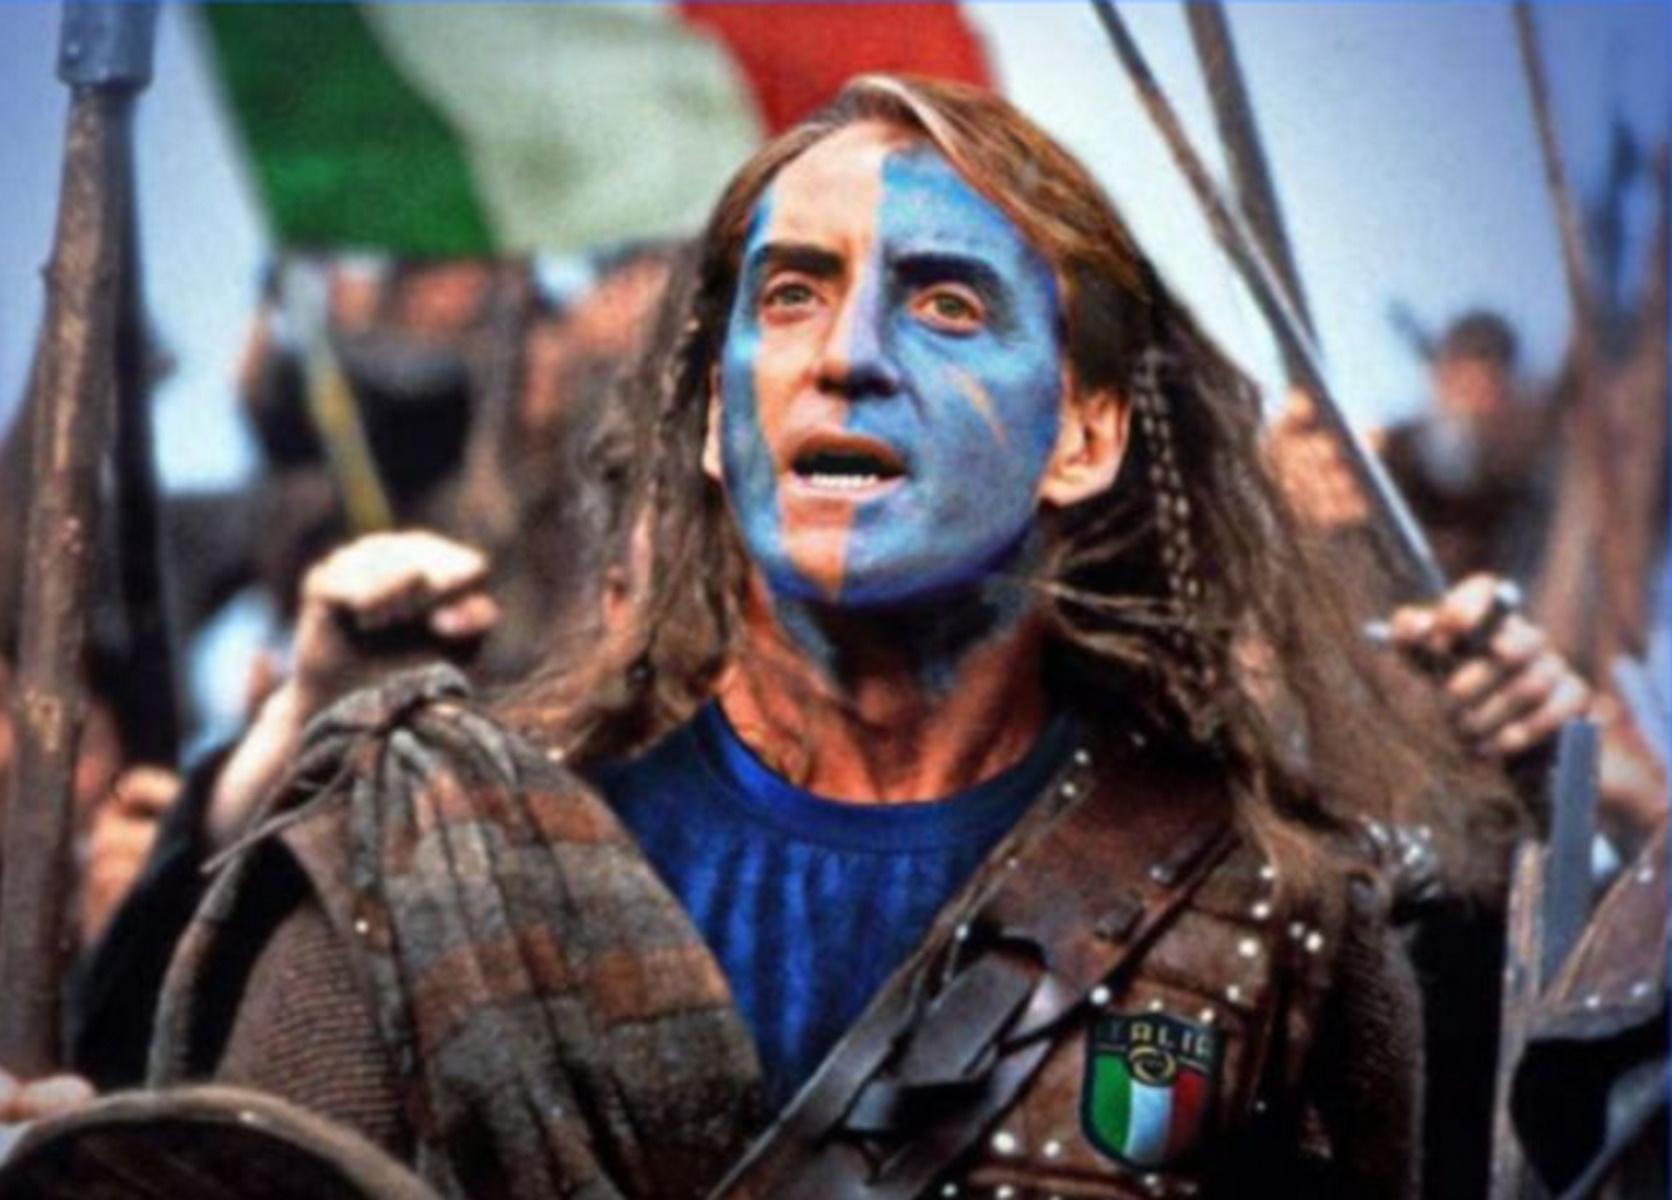 Euro 2020: Οι Σκωτσέζοι «μεταμόρφωσαν» τον Μαντσίνι σε «Braveheart» και στηρίζουν την Ιταλία στον τελικό